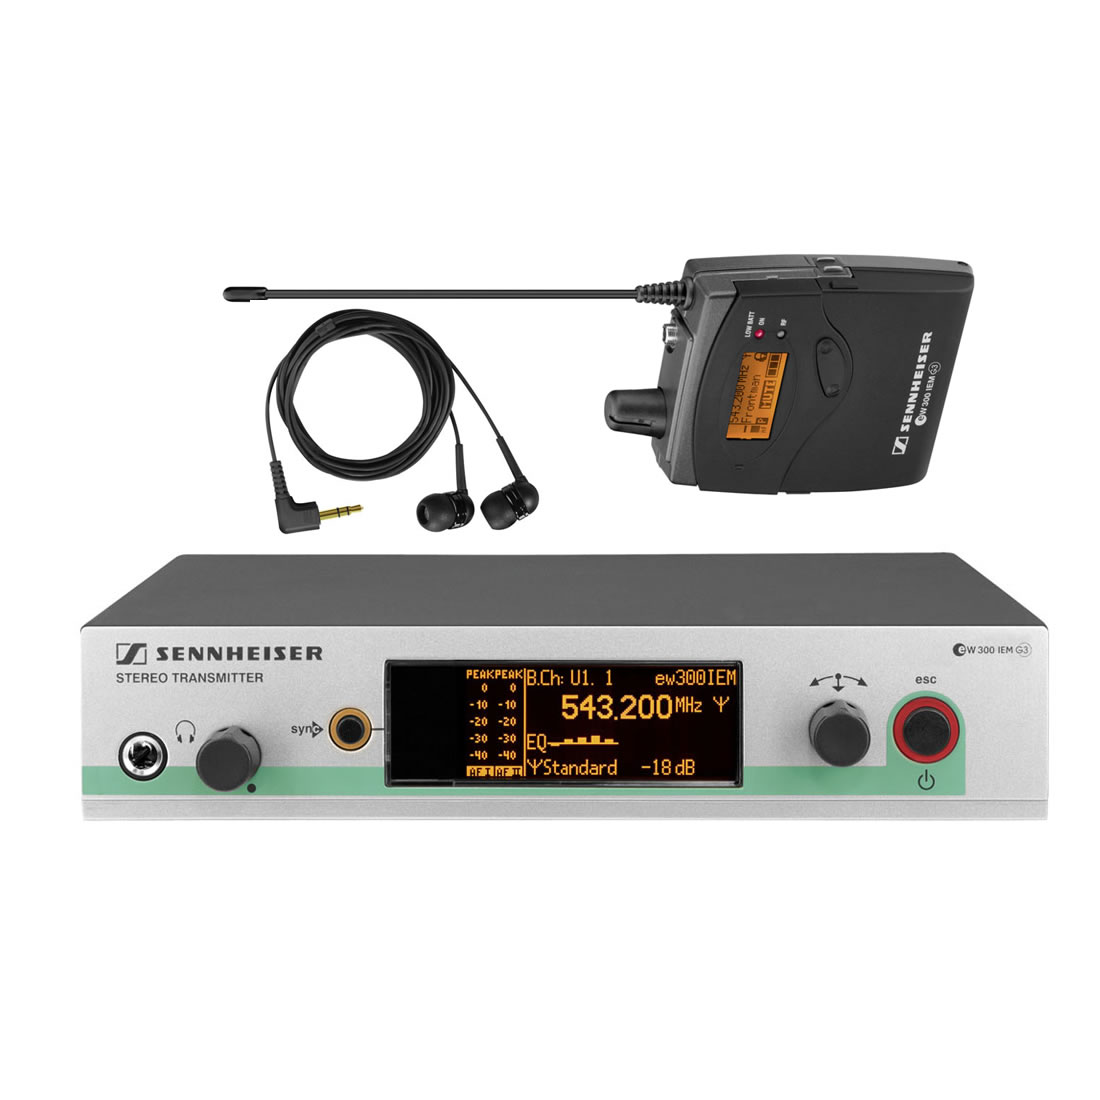 Sennheiser EW 300 IEM G3 Sistema Microfone Sem Fio, Monitoramento